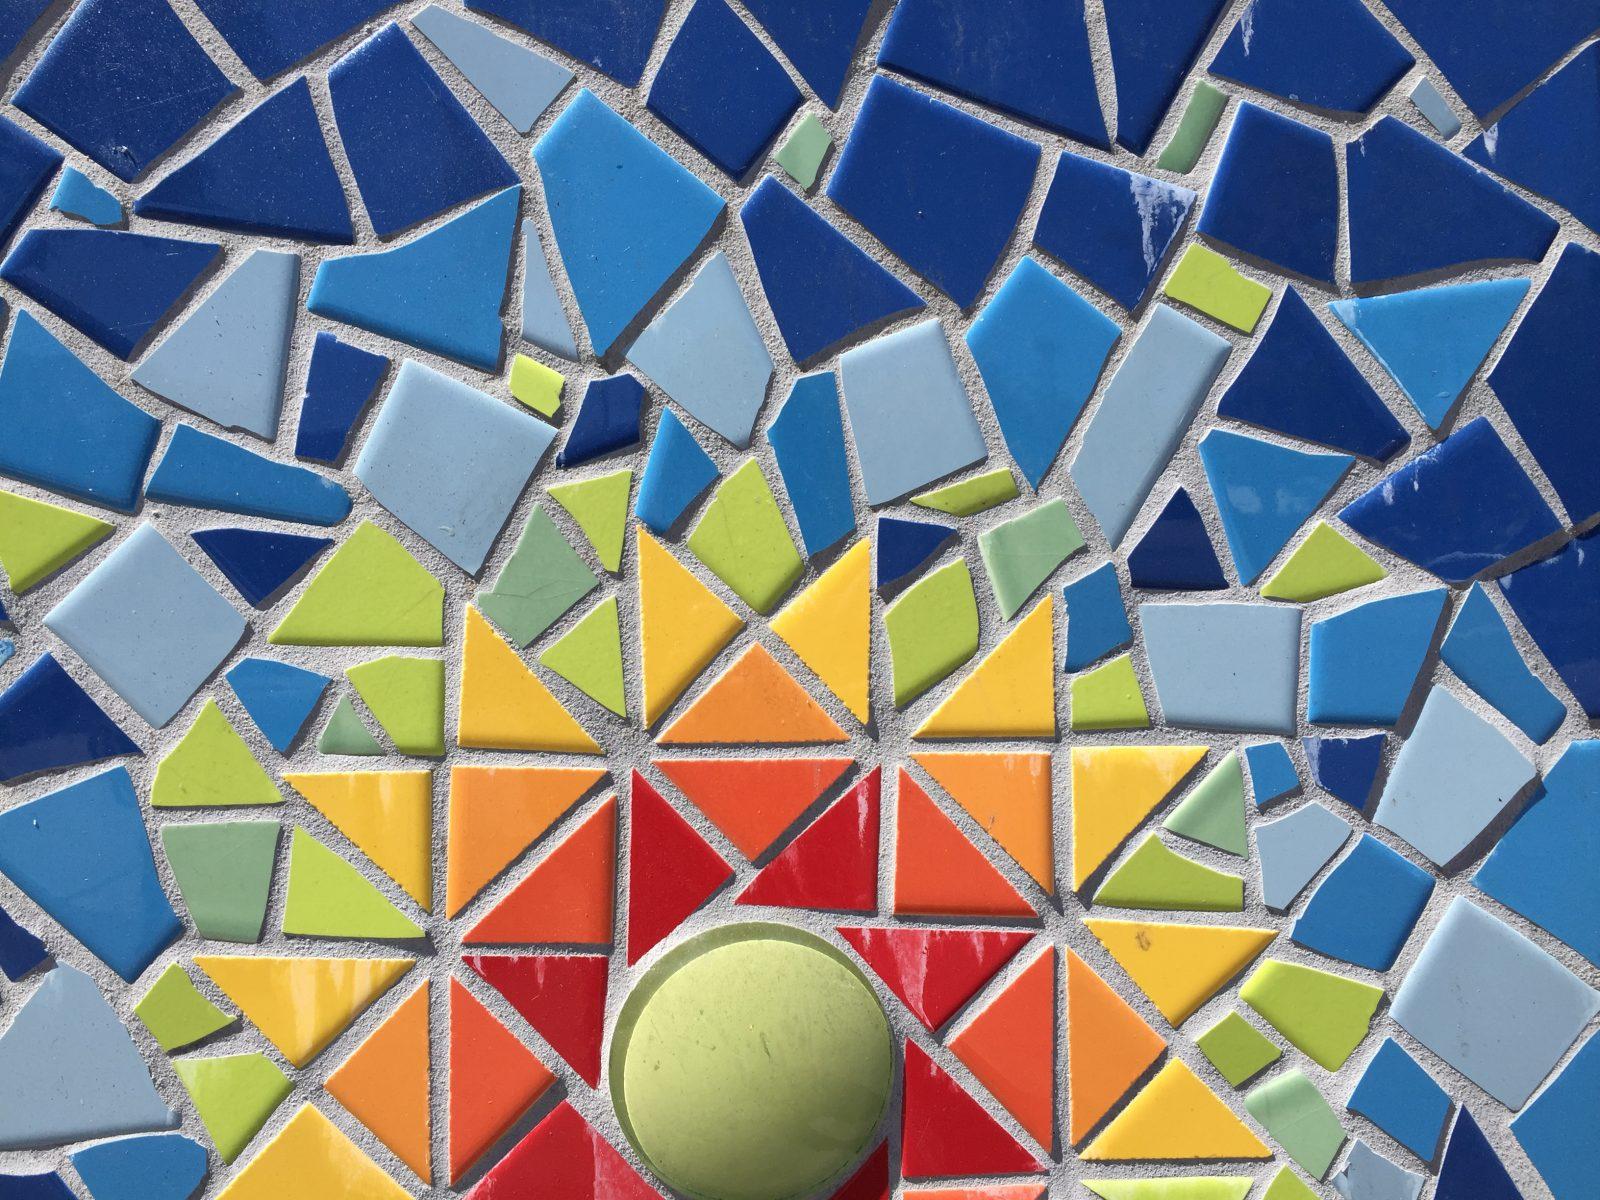 Why Mosaic